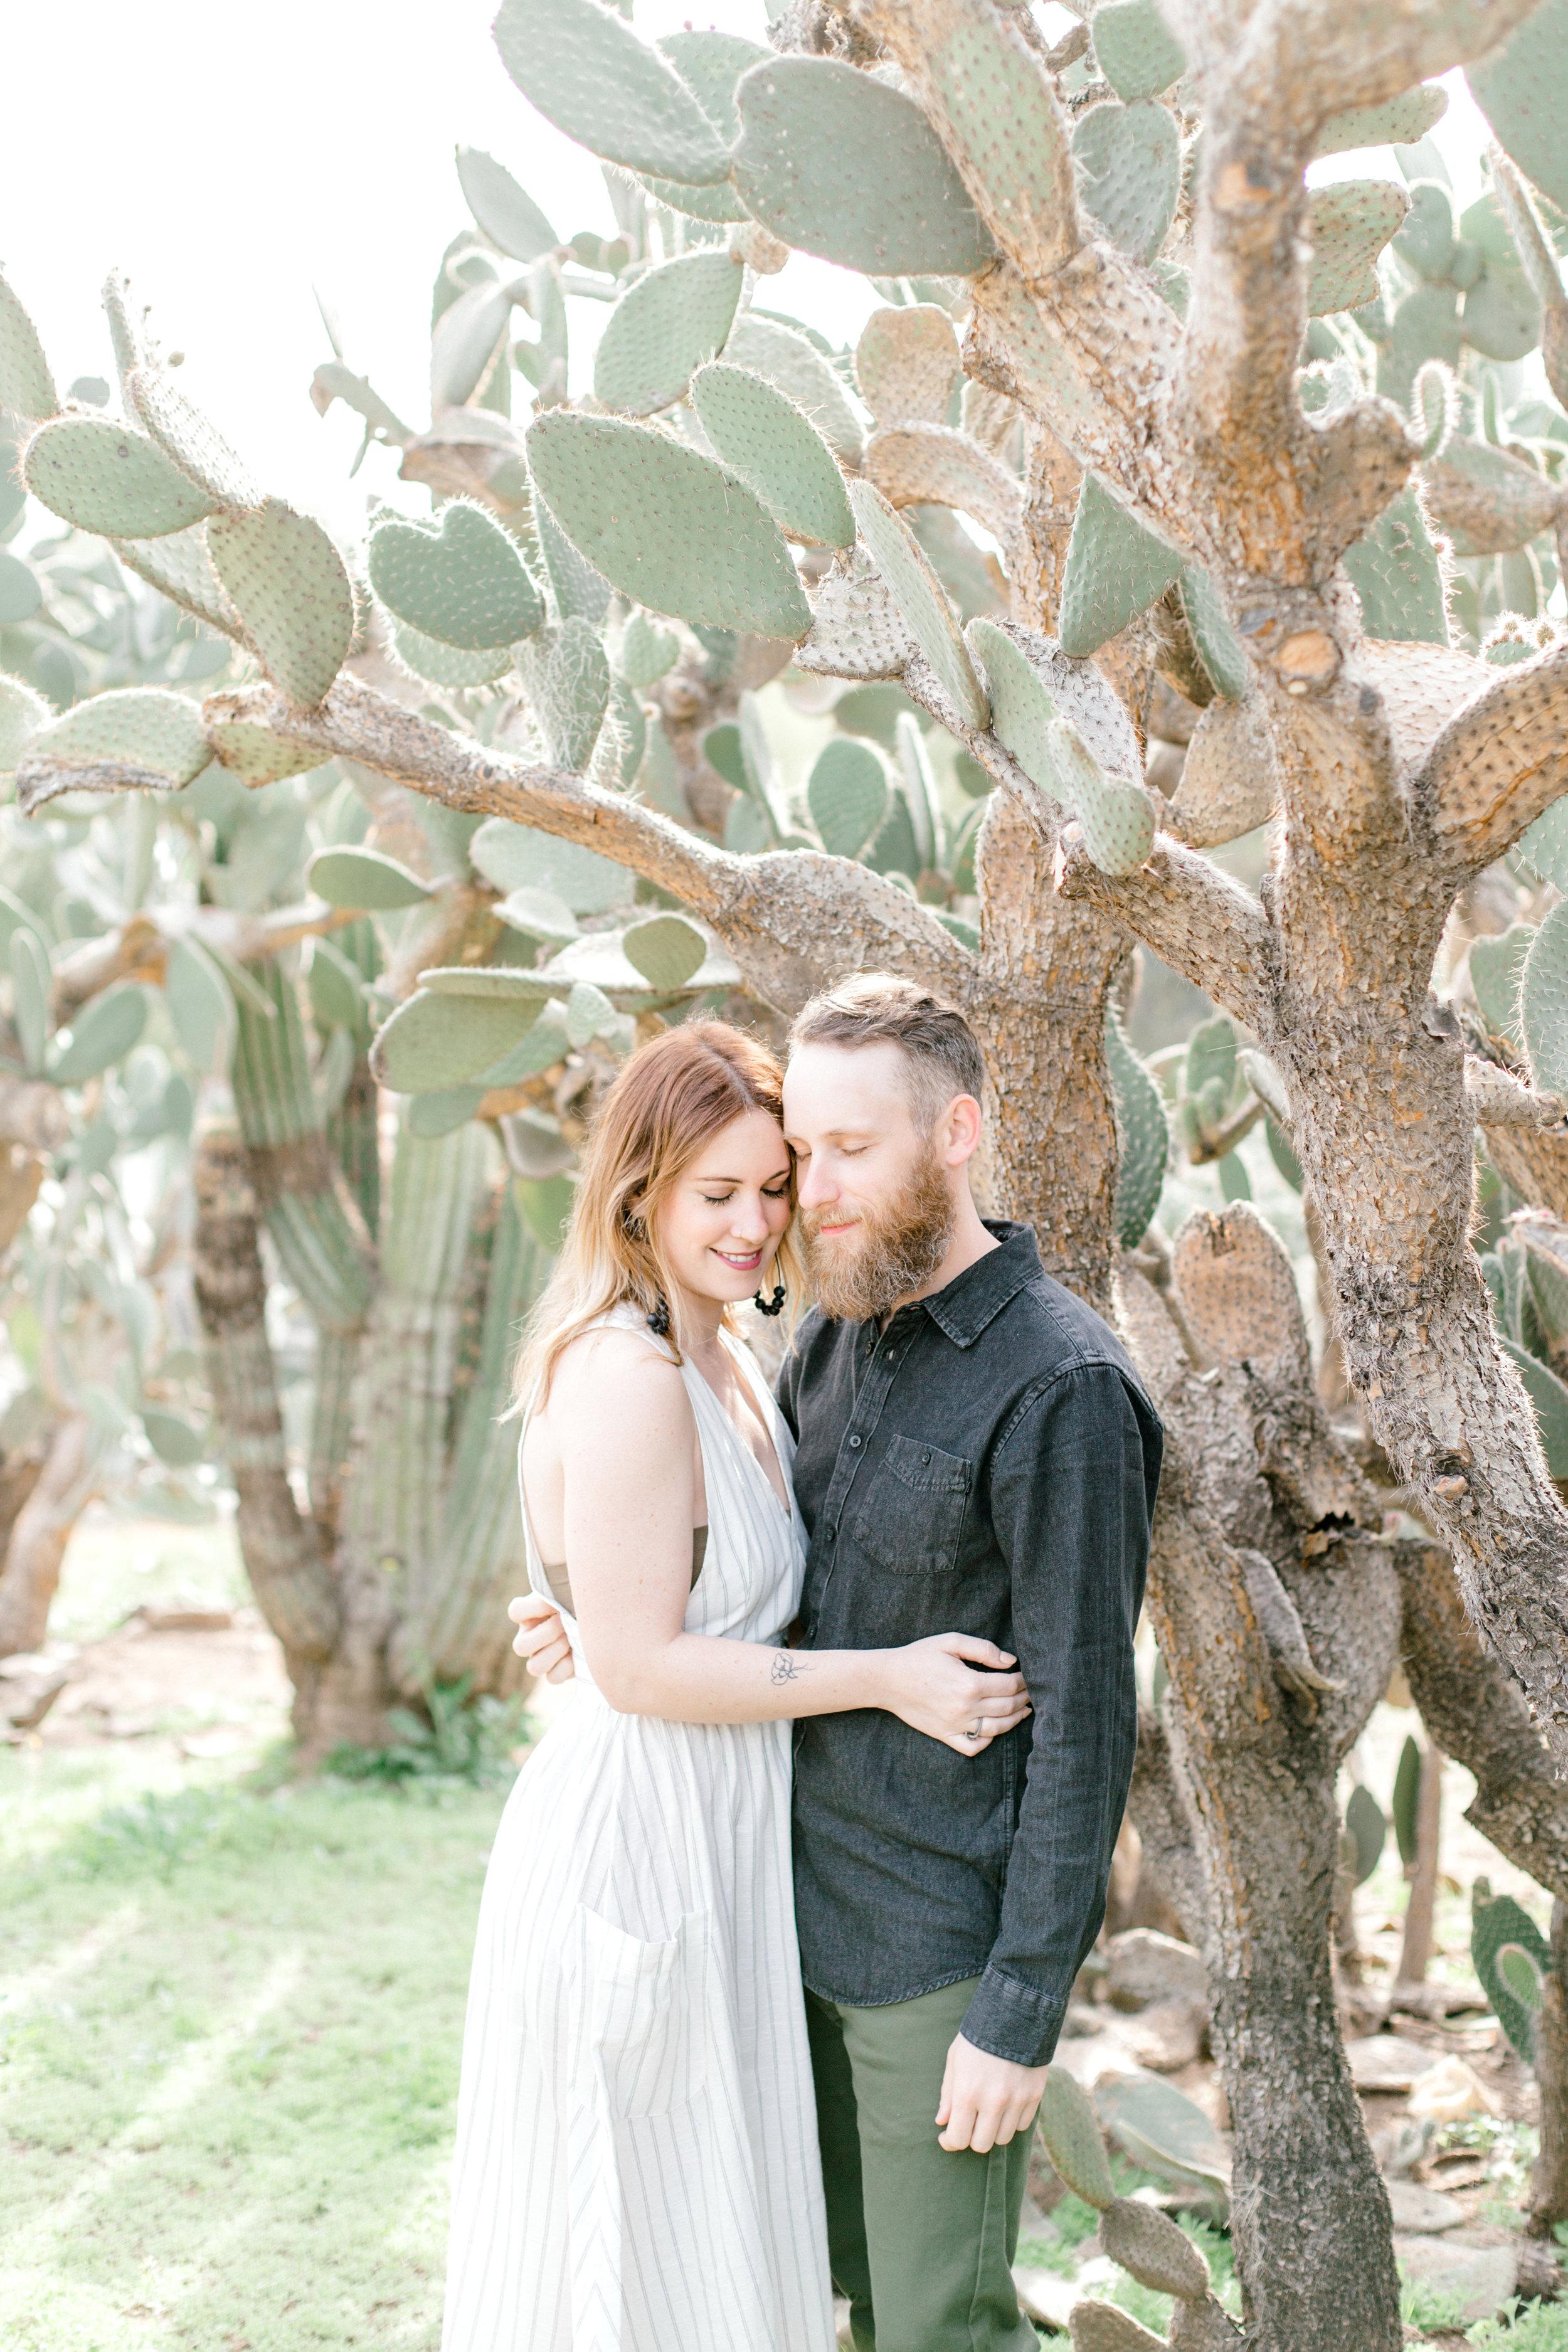 jessica sgubin photography atlanta portrait photographer cacti garden engagement family couple wedding joshua tree wedding elopement-1.jpg